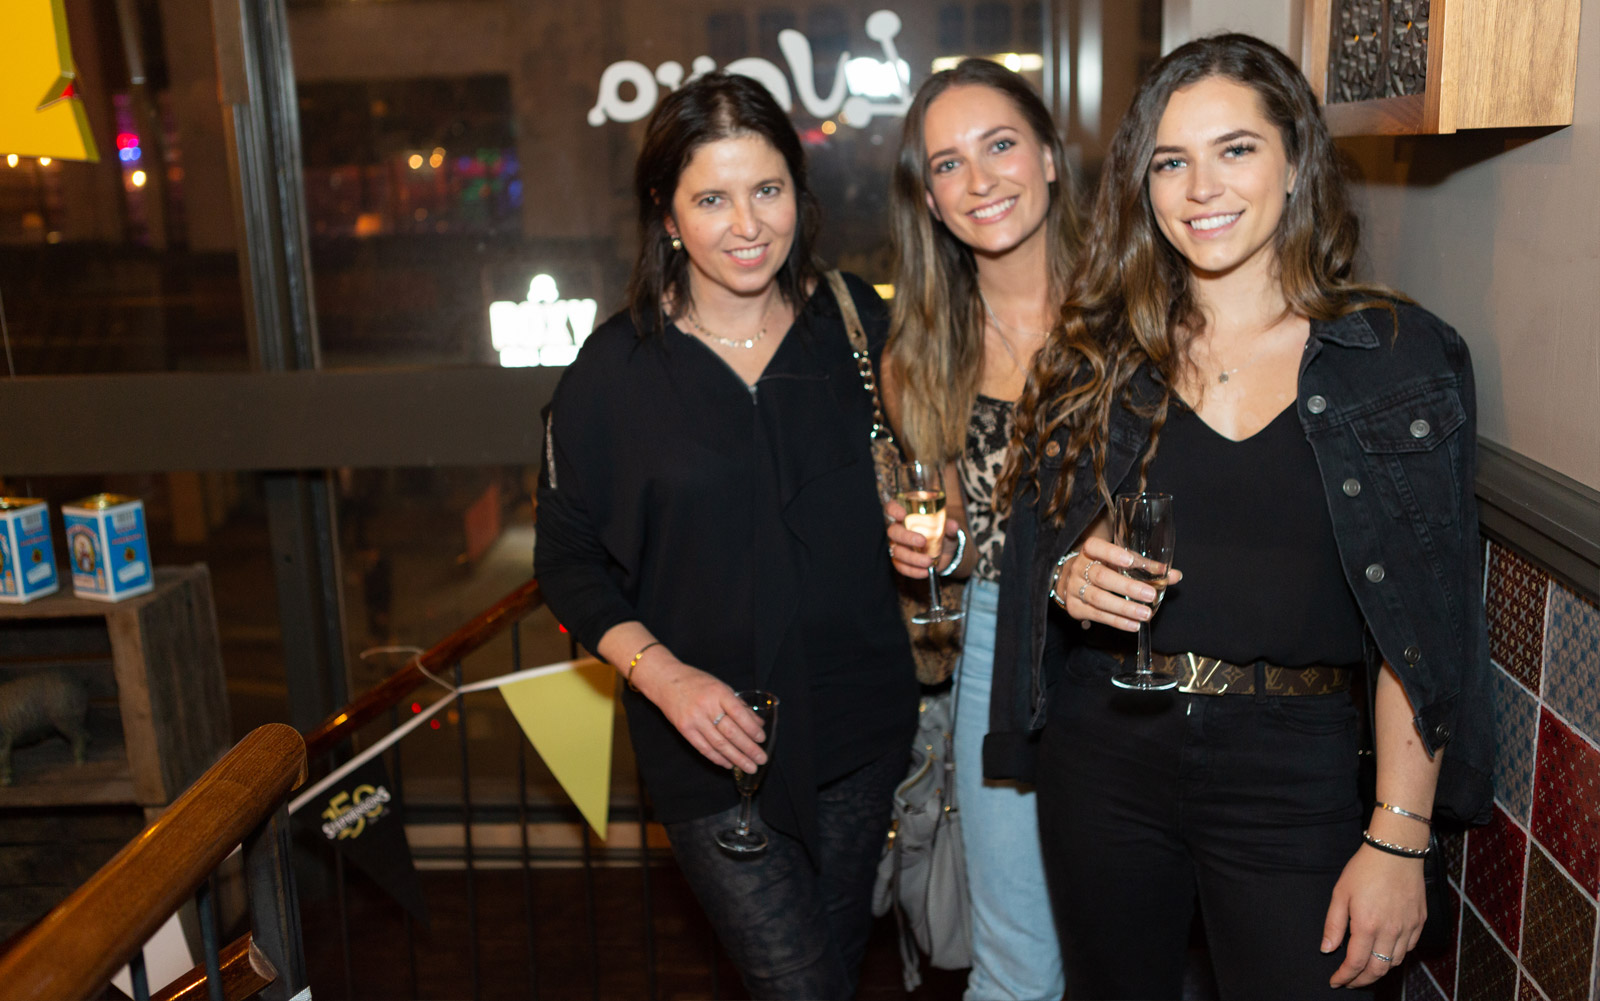 Nicolla, Georgia and Ellie Hudson